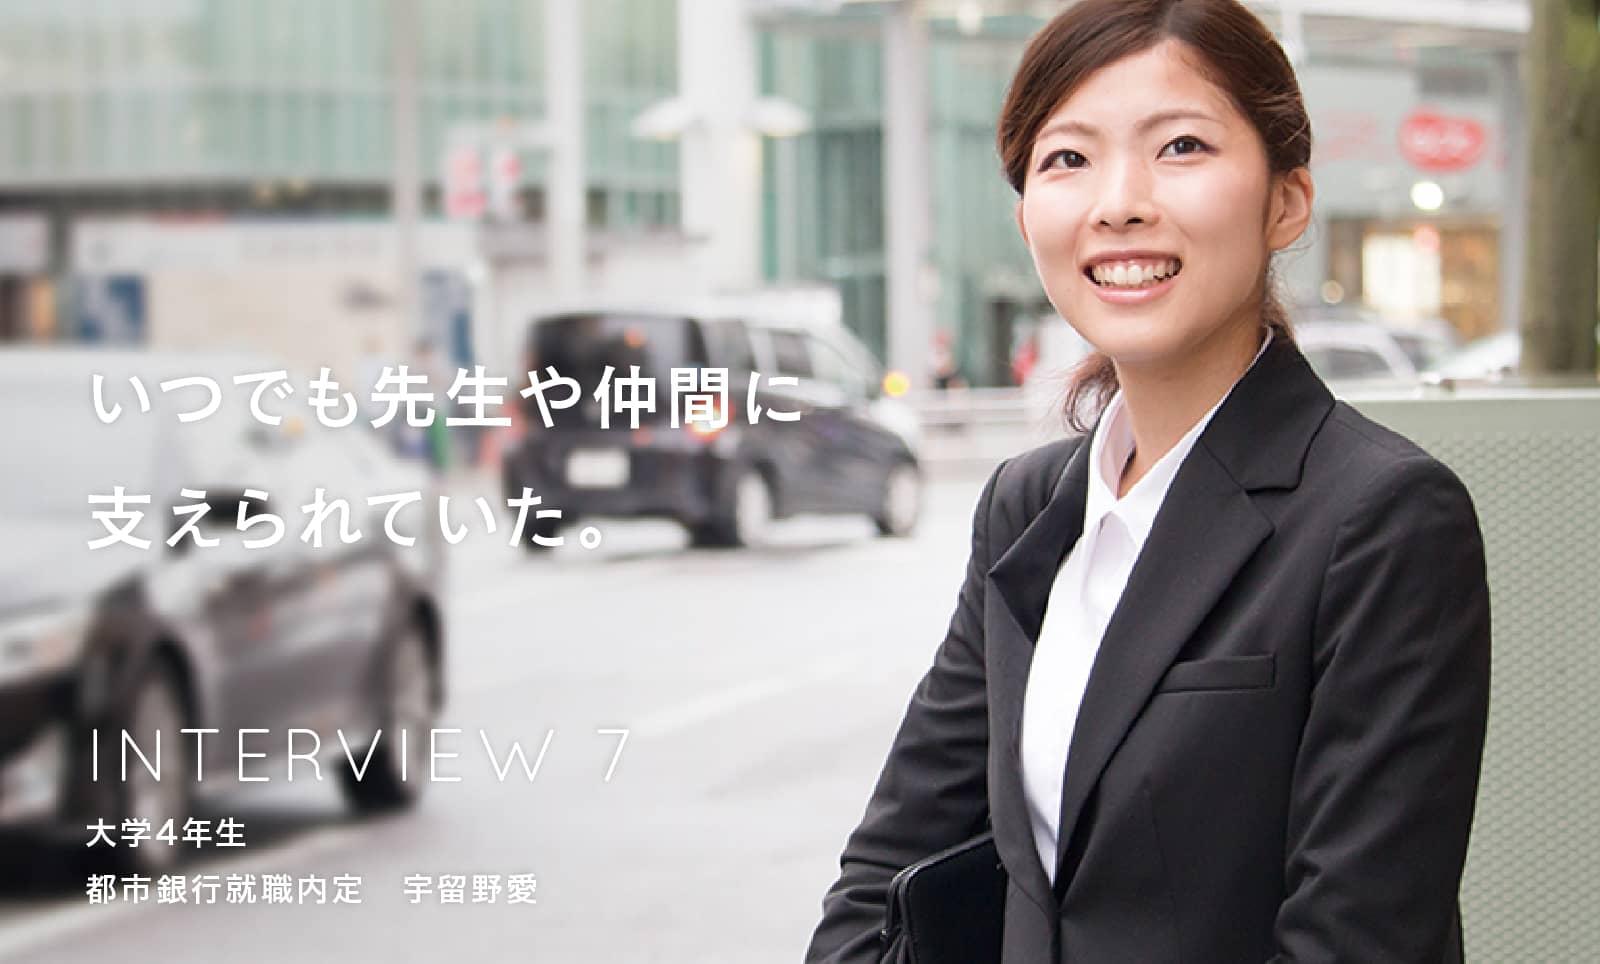 INTERVIEW 05 都市銀行 宇留野 愛 さん